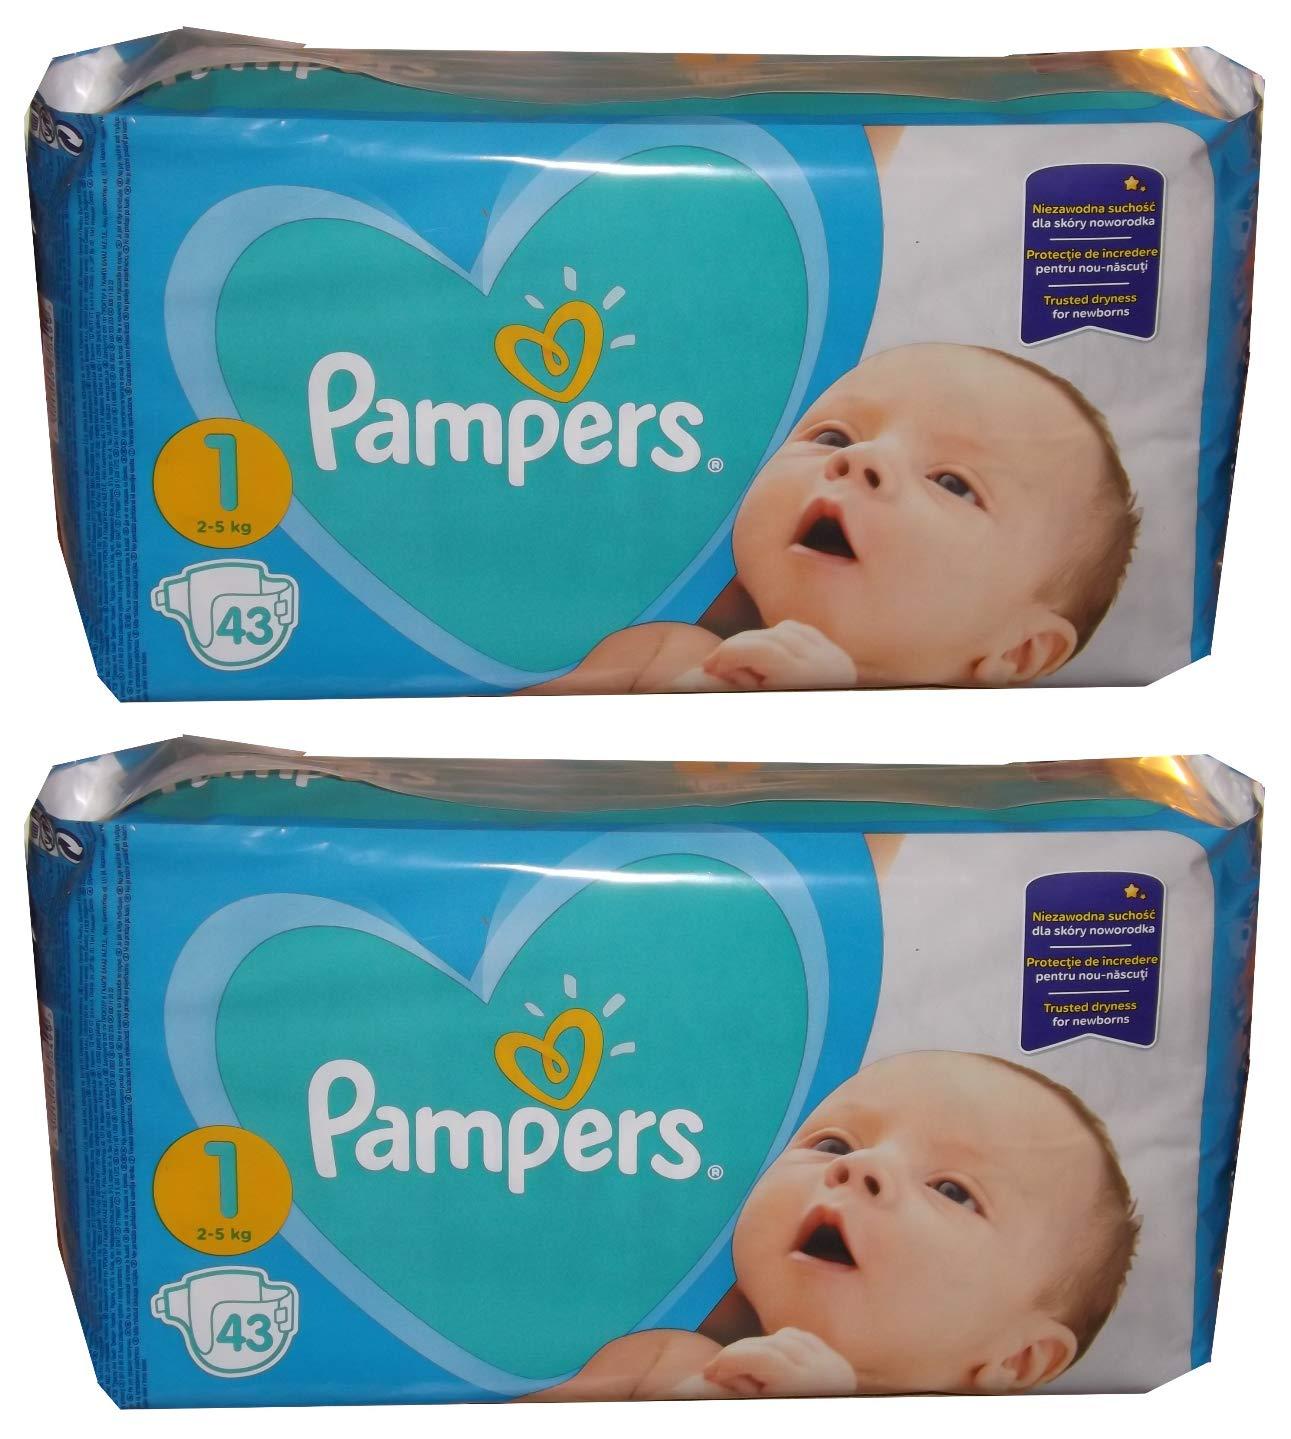 2 x 43 newborn 86 2-5 kg 1 beb/é pa/ñales New DRY Gr peso: 2-5KG